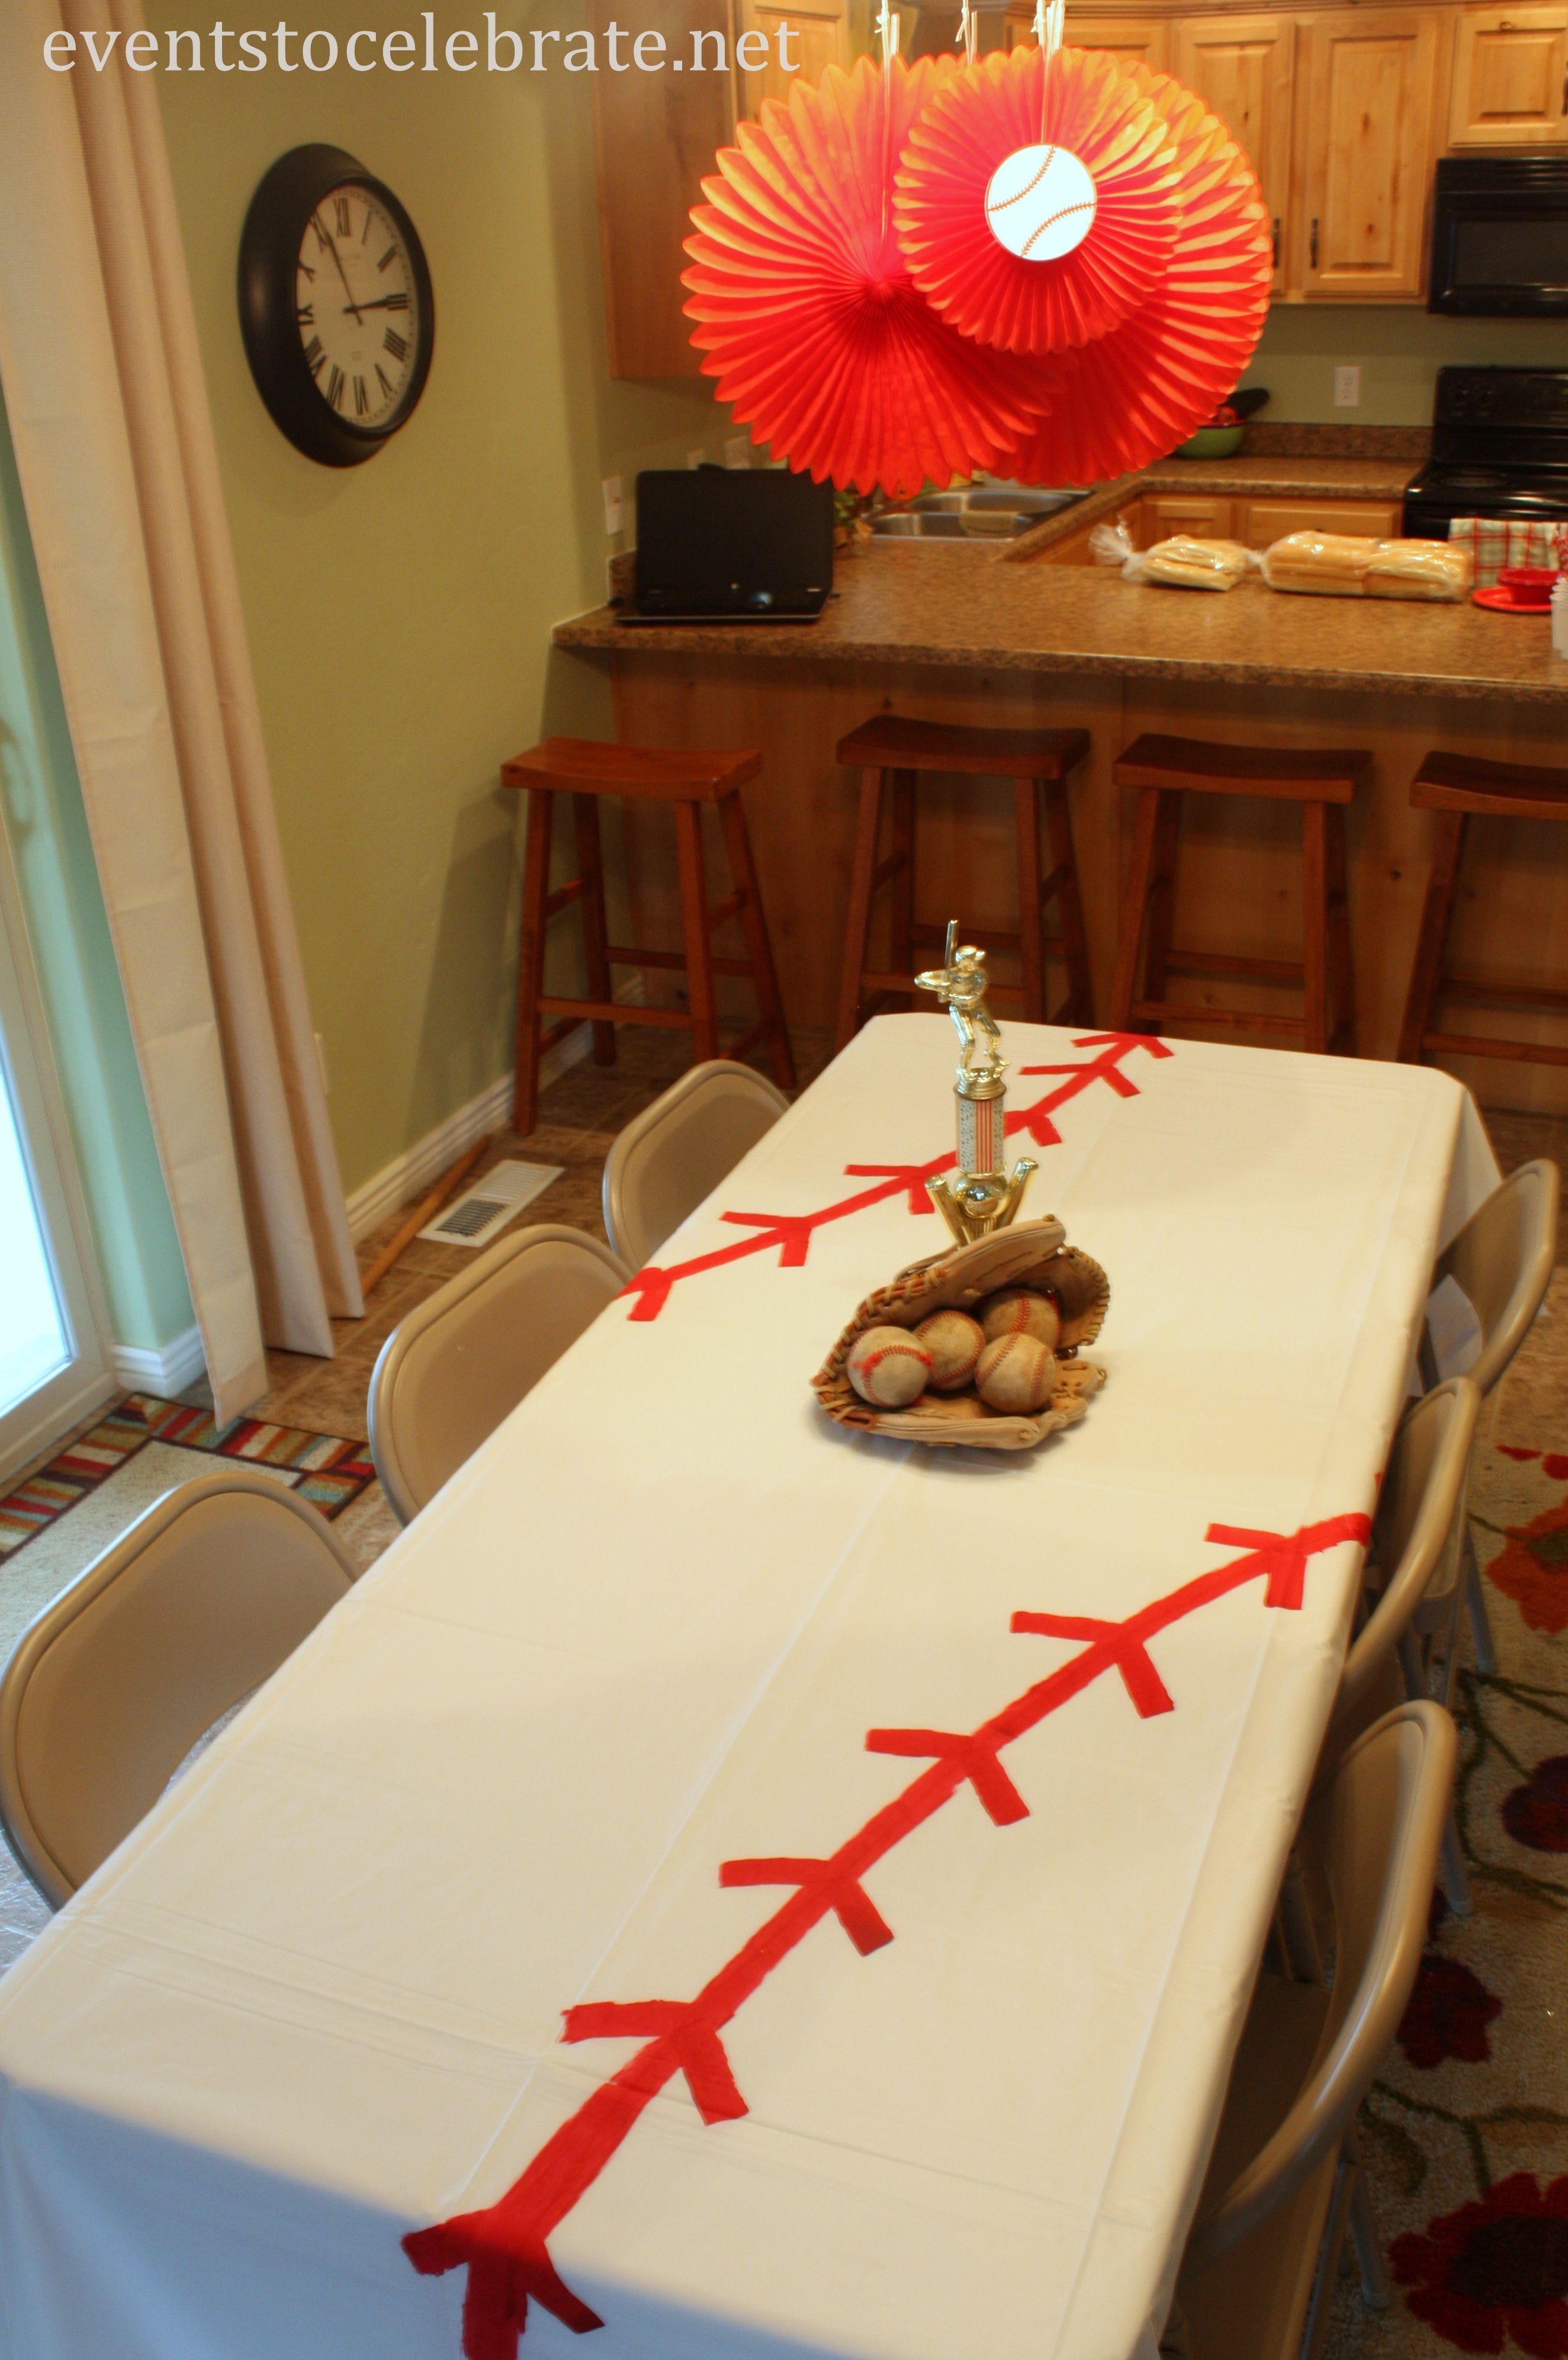 Theme Diy  DIY Baseball Tablecloth Events To Celebrate